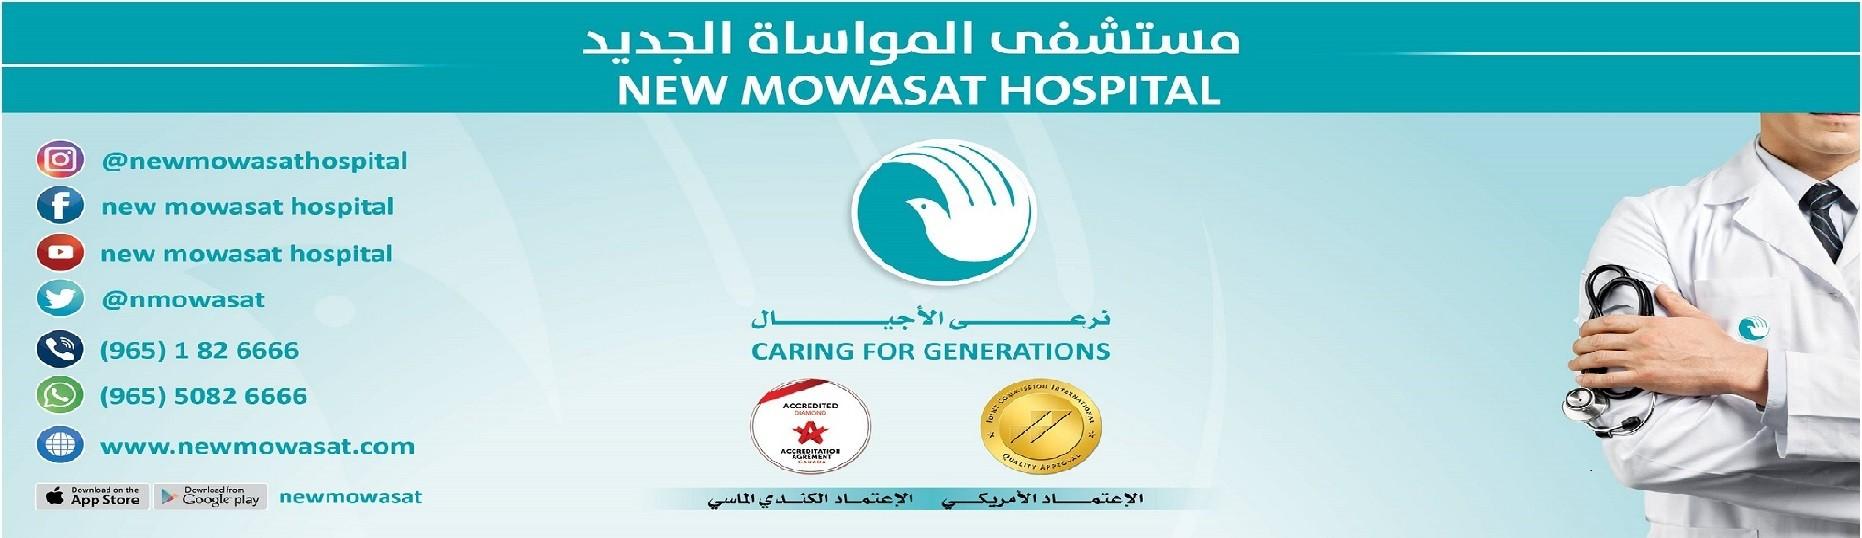 New Mowasat Hospital | LinkedIn